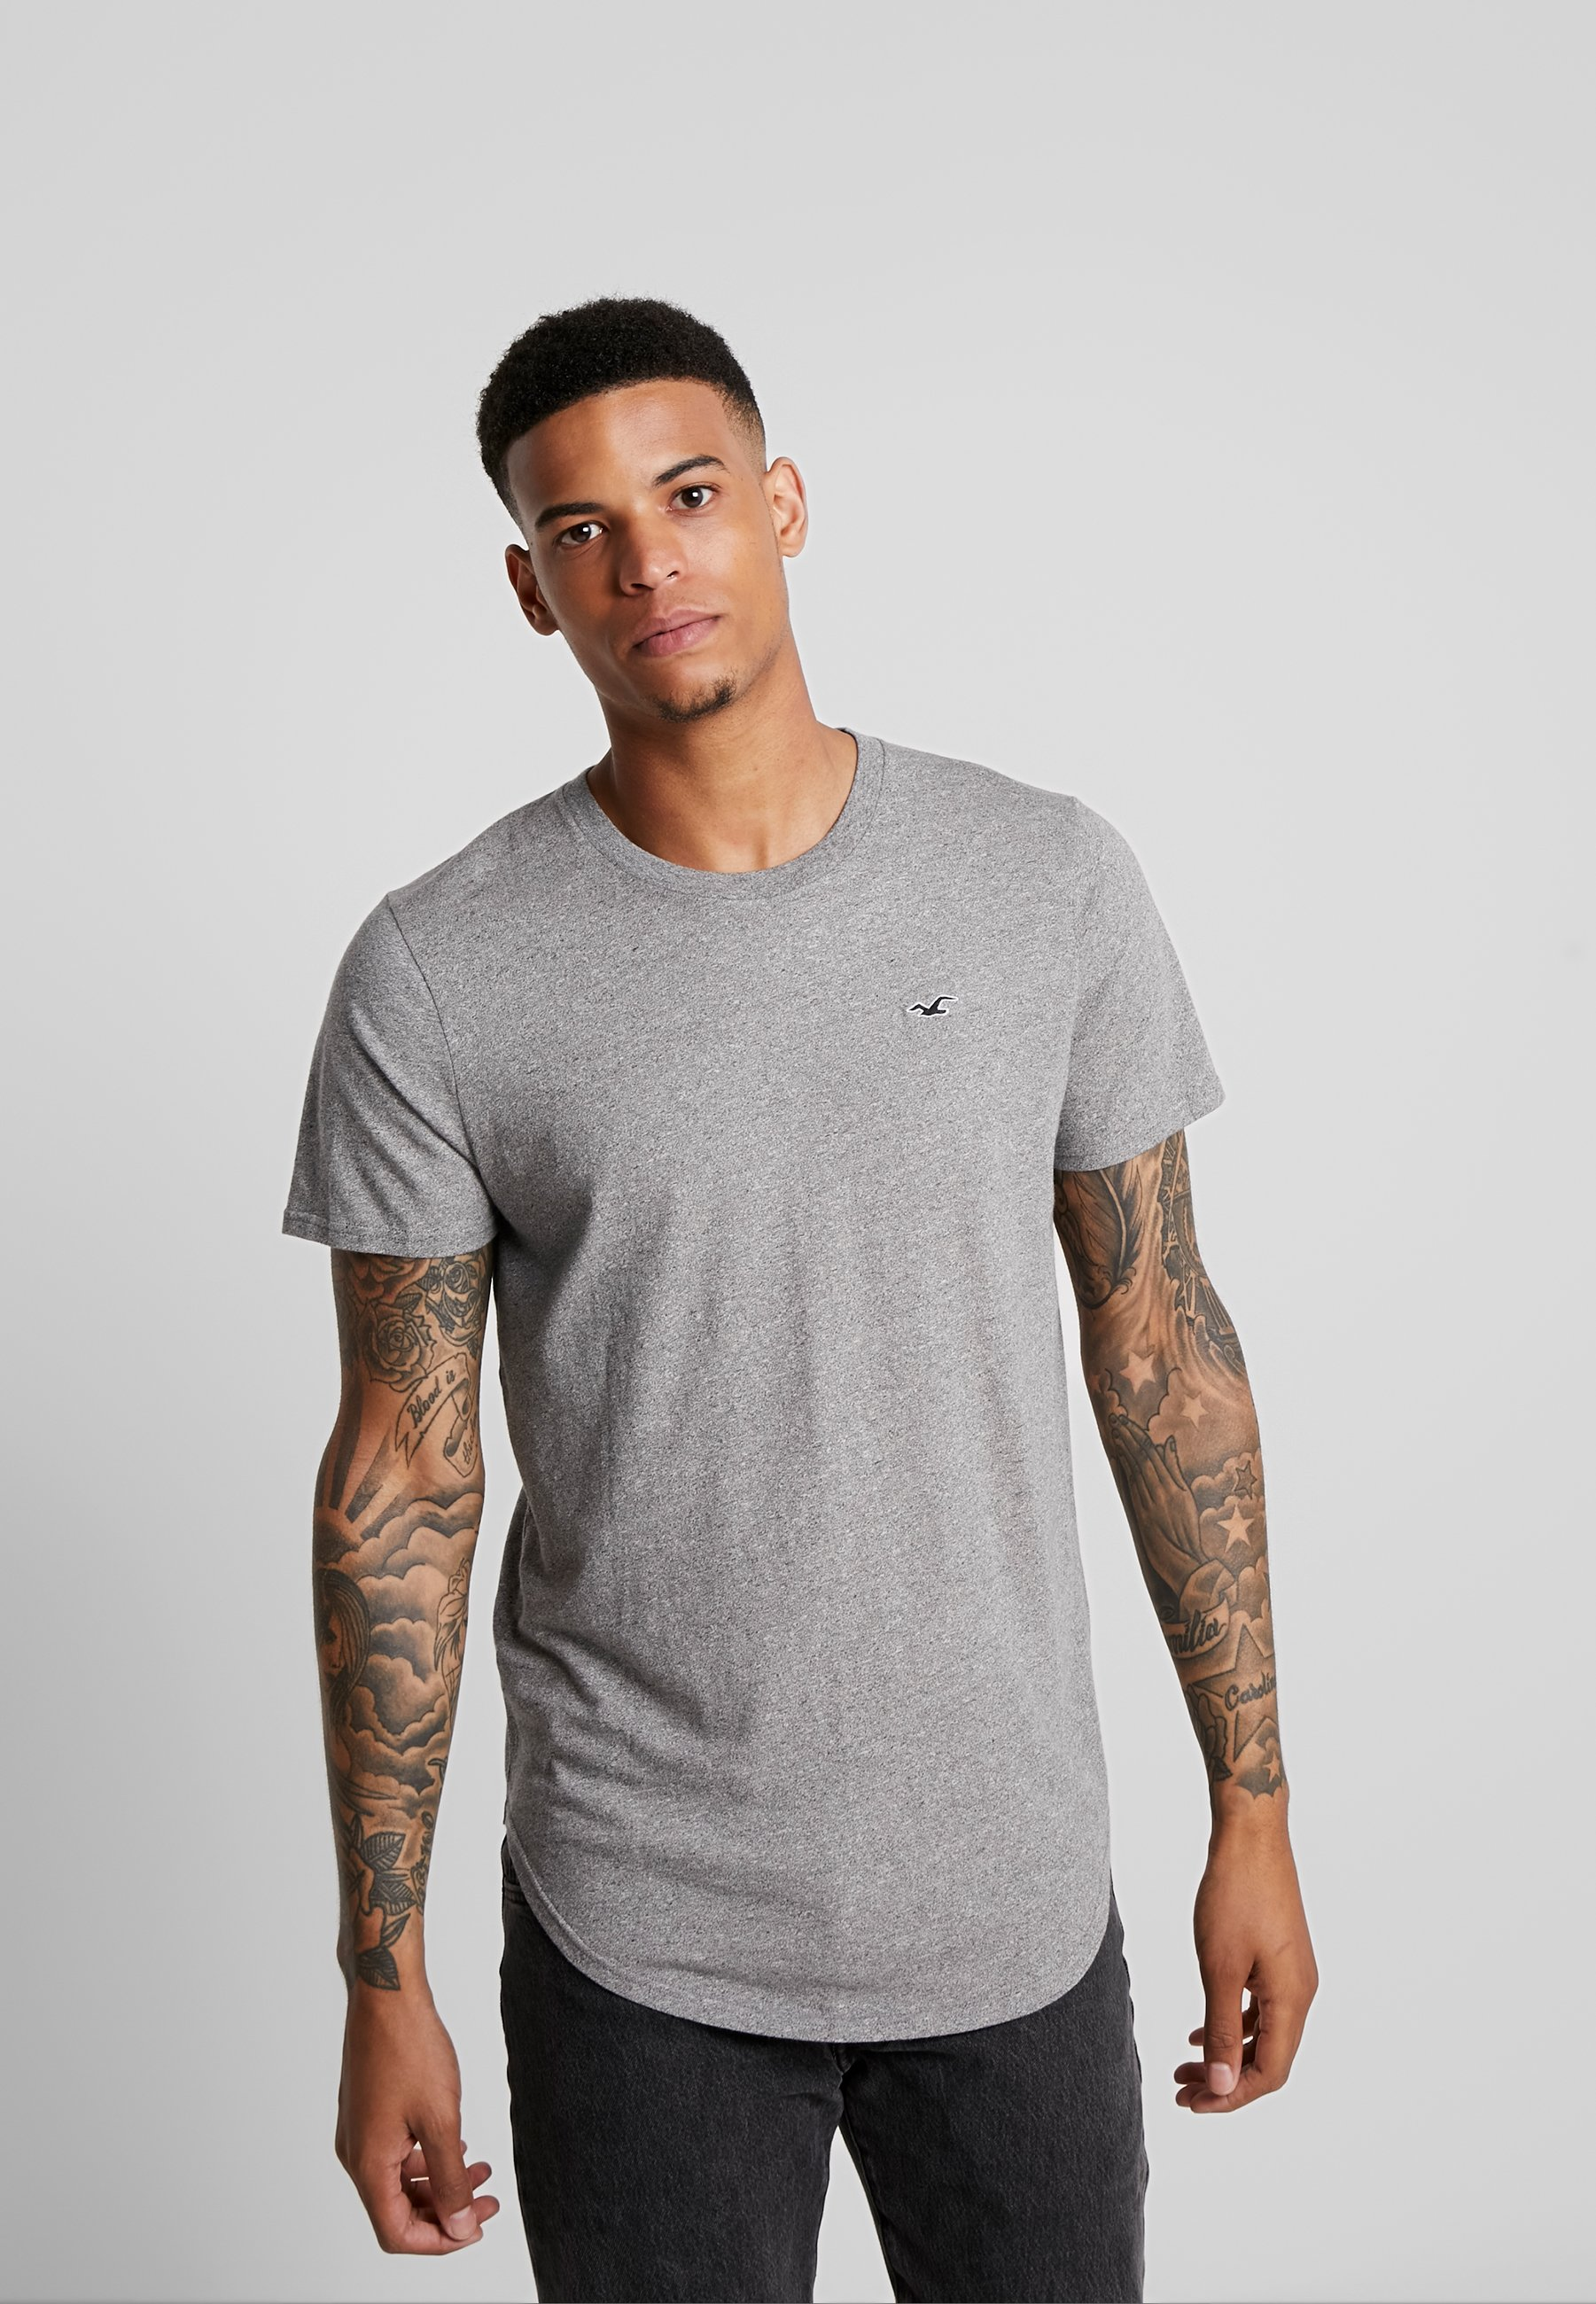 shirt Co3 Hollister PackT Basique WhiteGreyblack zpGqMSUV